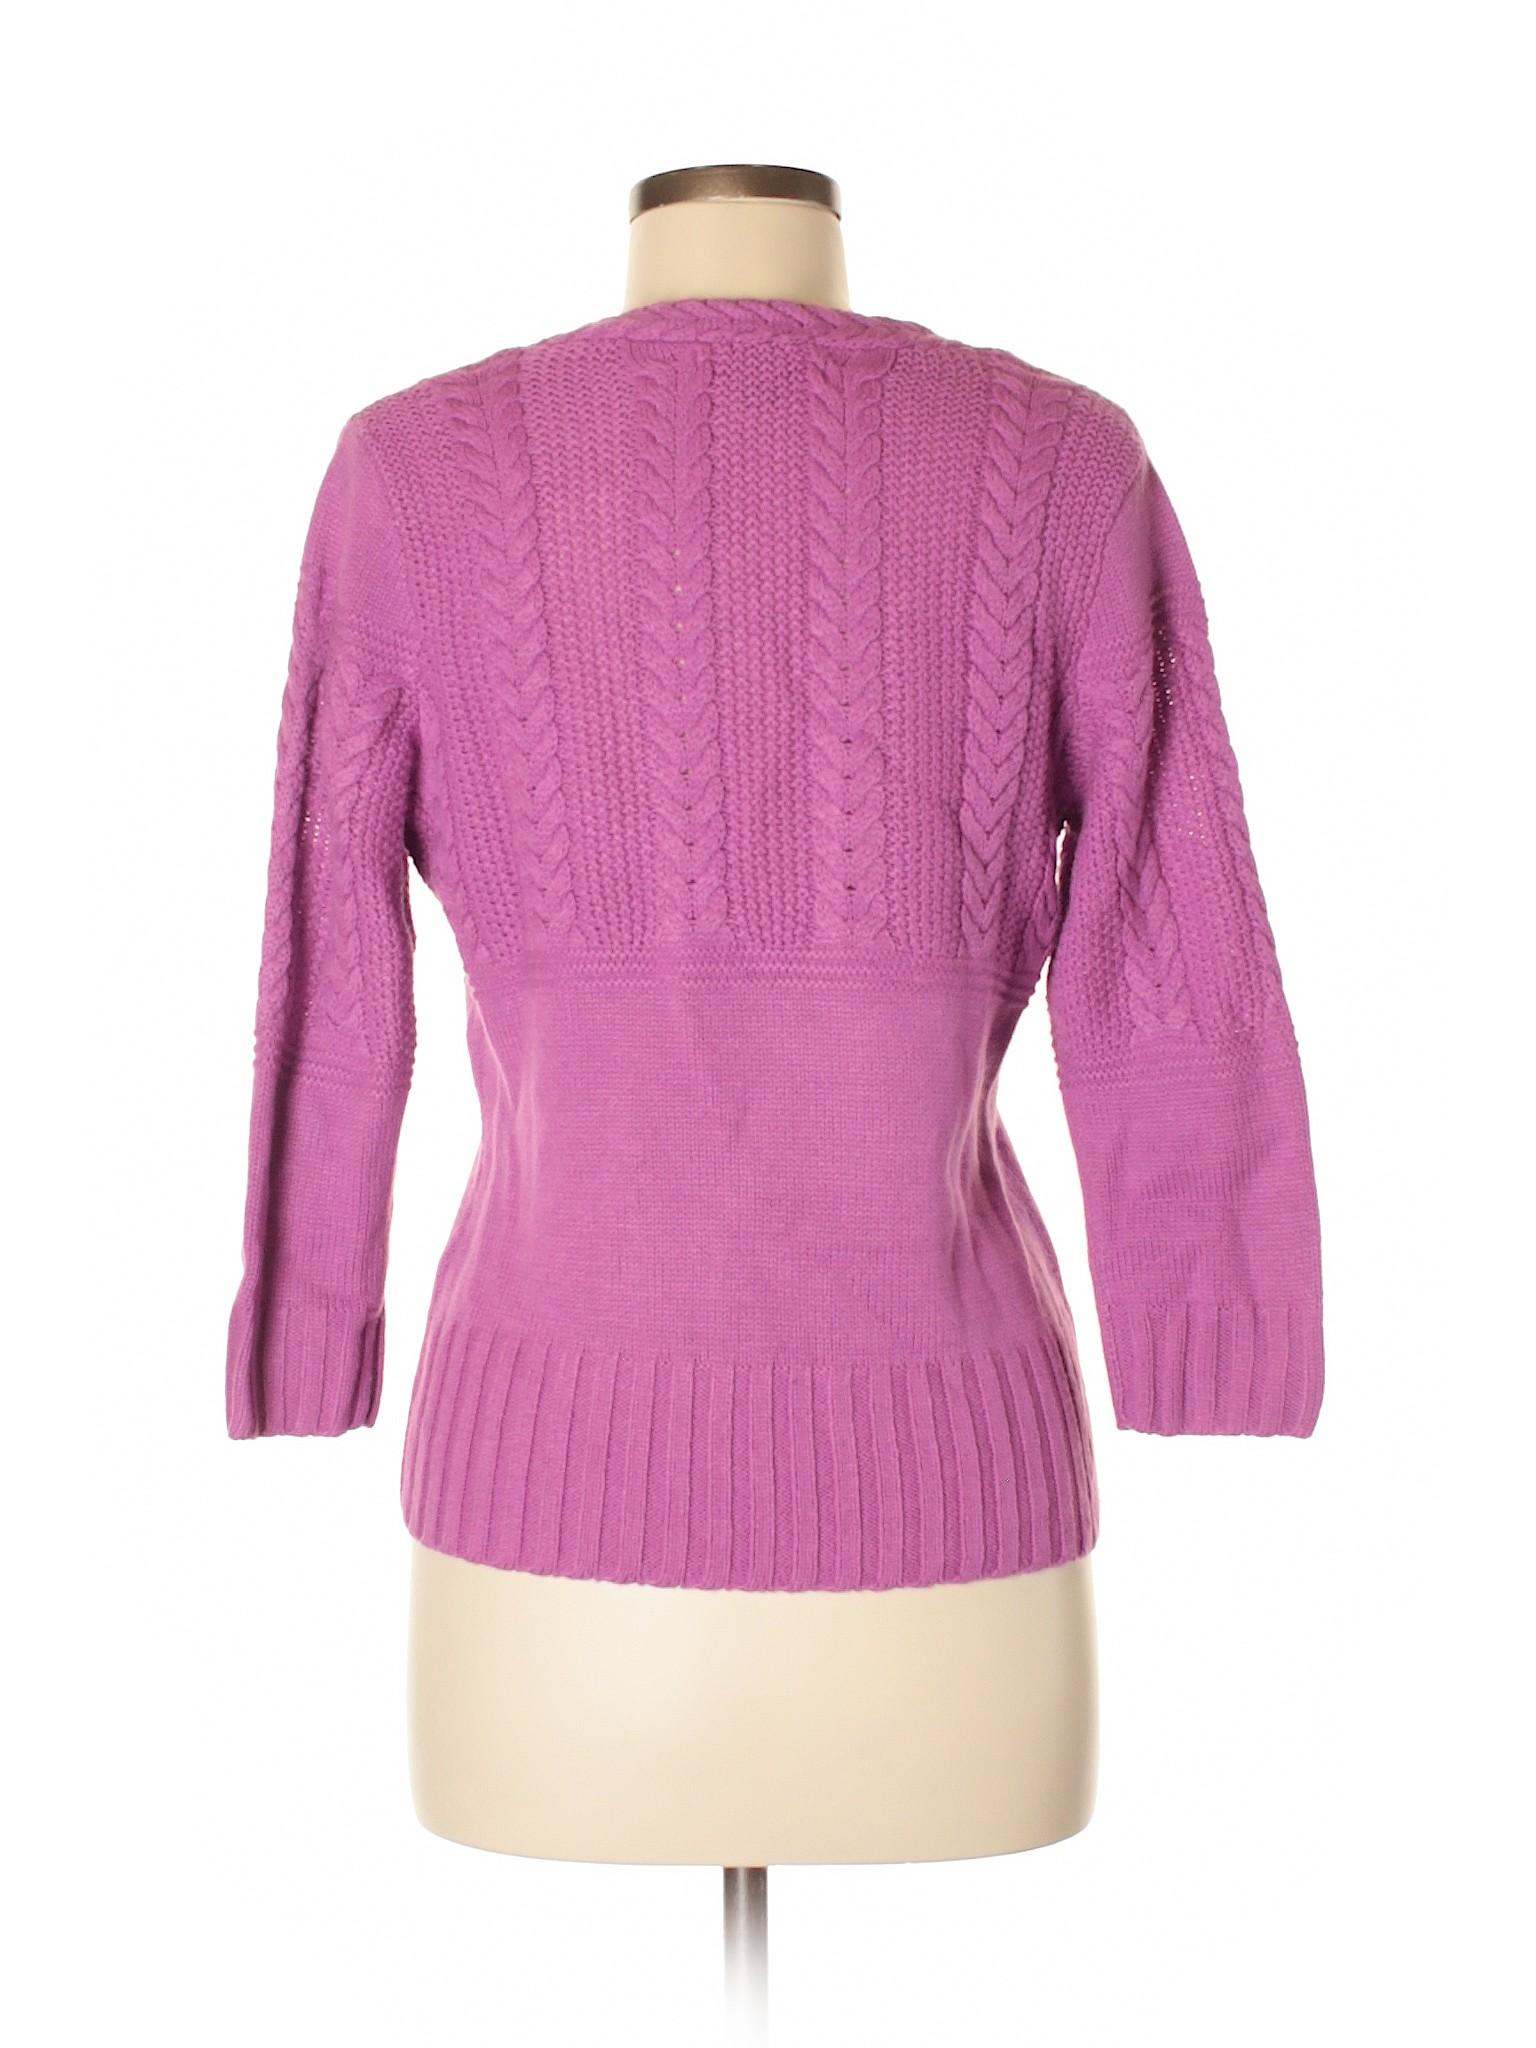 Winter Sweater Winter Pullover Sweater Sweater Boutique Winter Boutique Express Boutique Express Pullover Express Boutique Pullover nCRqPx